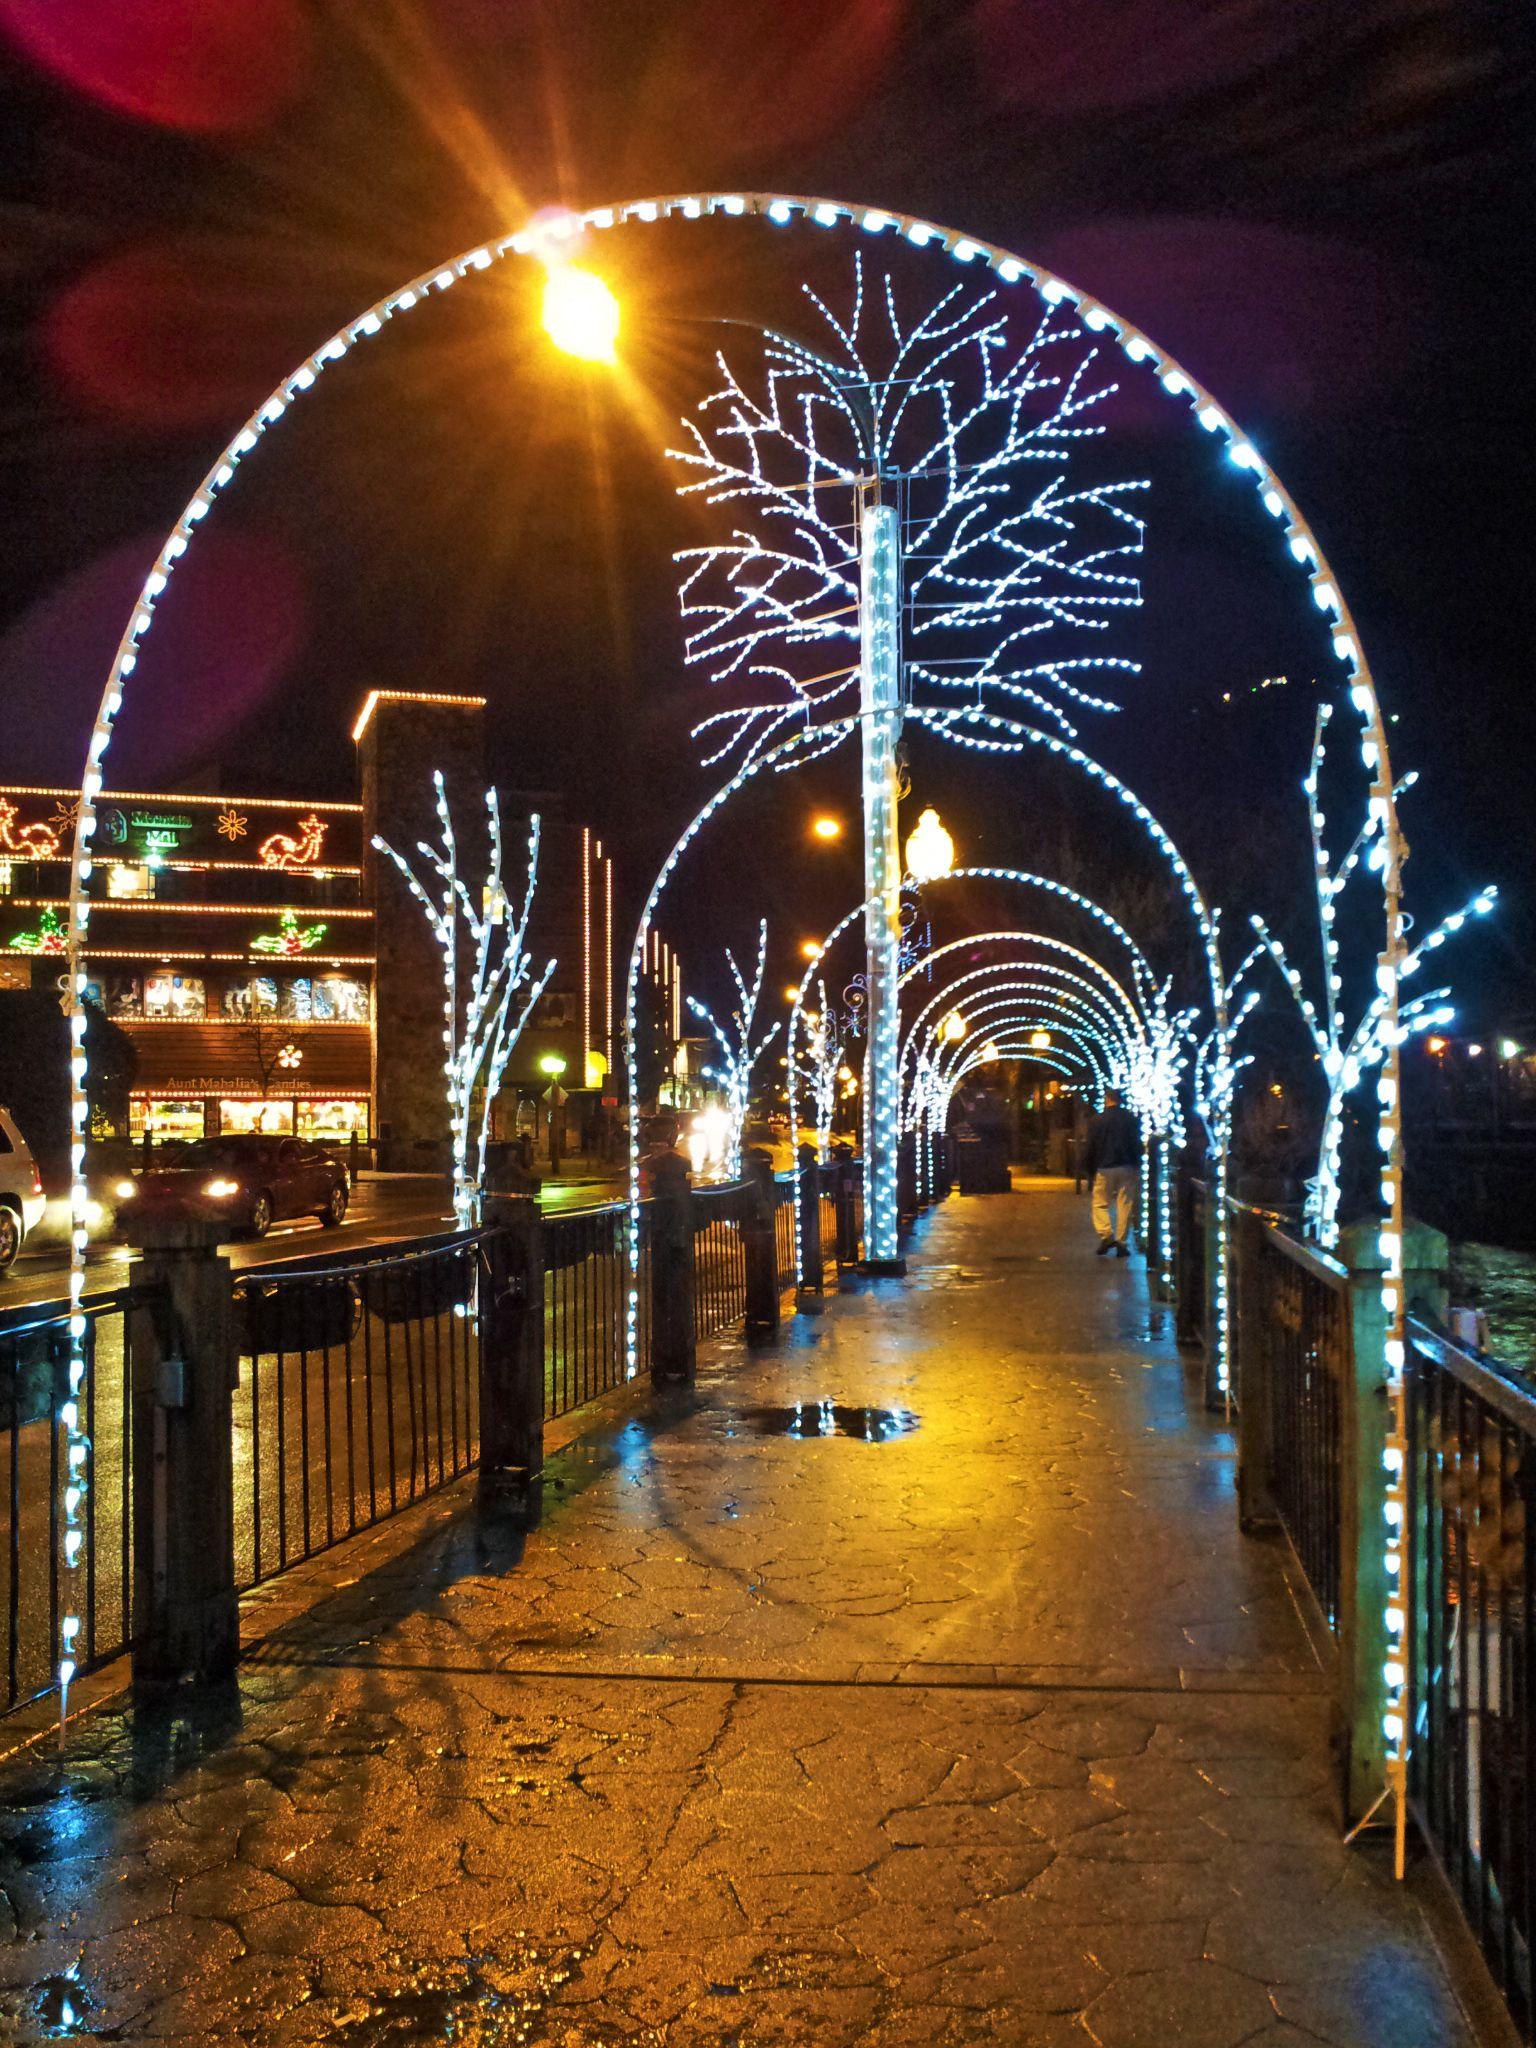 Gatlinburg Tn Christmas Lights.Christmas Lit River Walkway In Gatlinburg Tn Taken With My